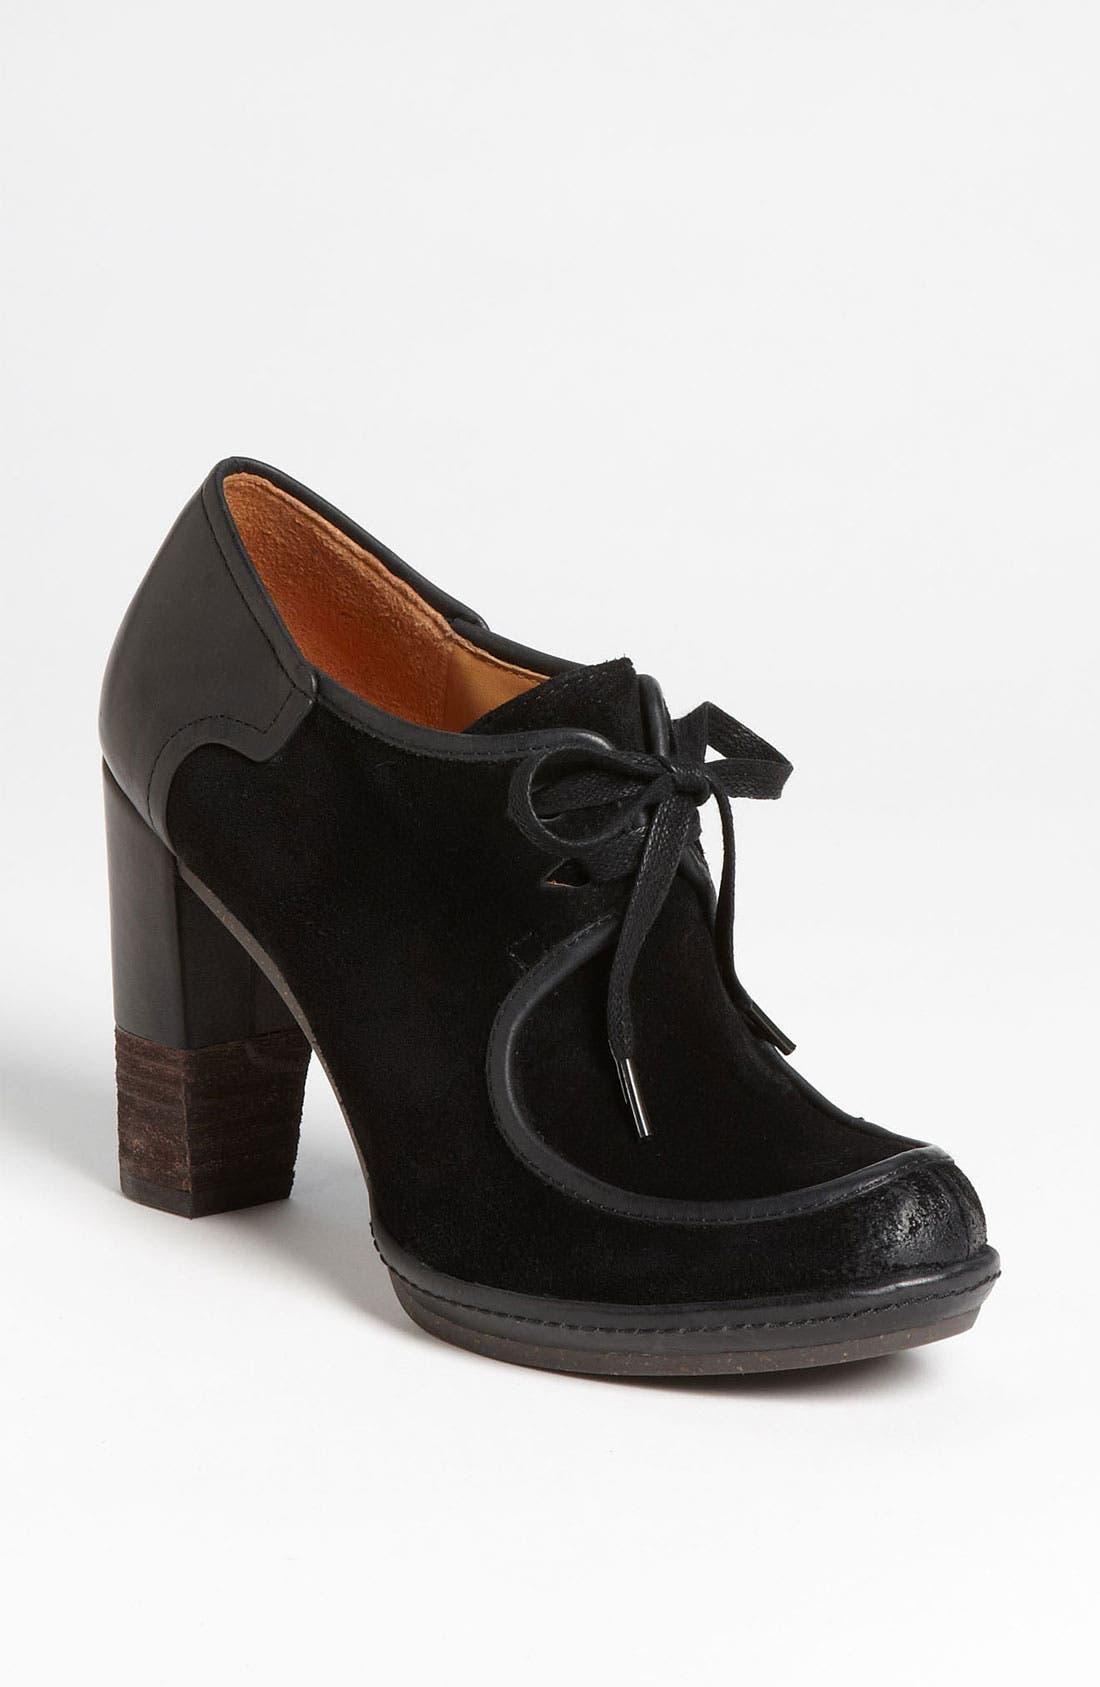 Alternate Image 1 Selected - Naya 'Mindy' Boot